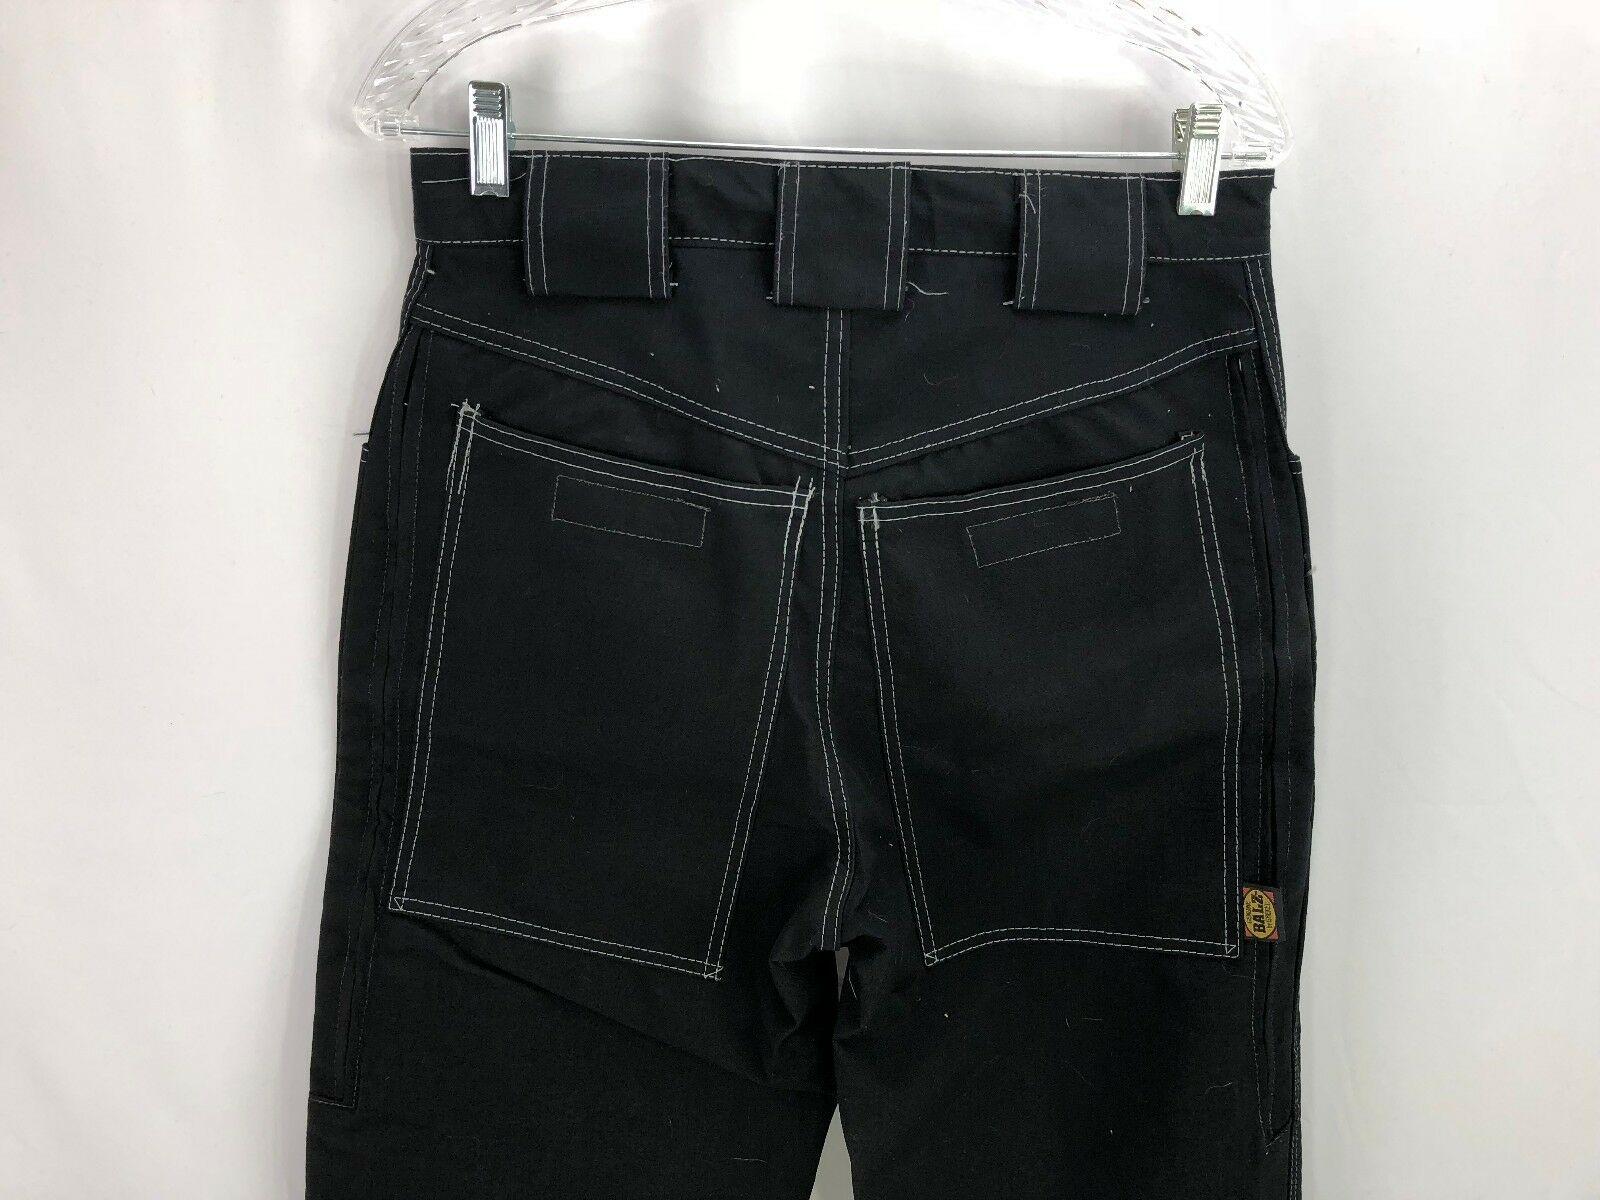 Genuine Balz Snowboarding Snowboard Pants Black Size S